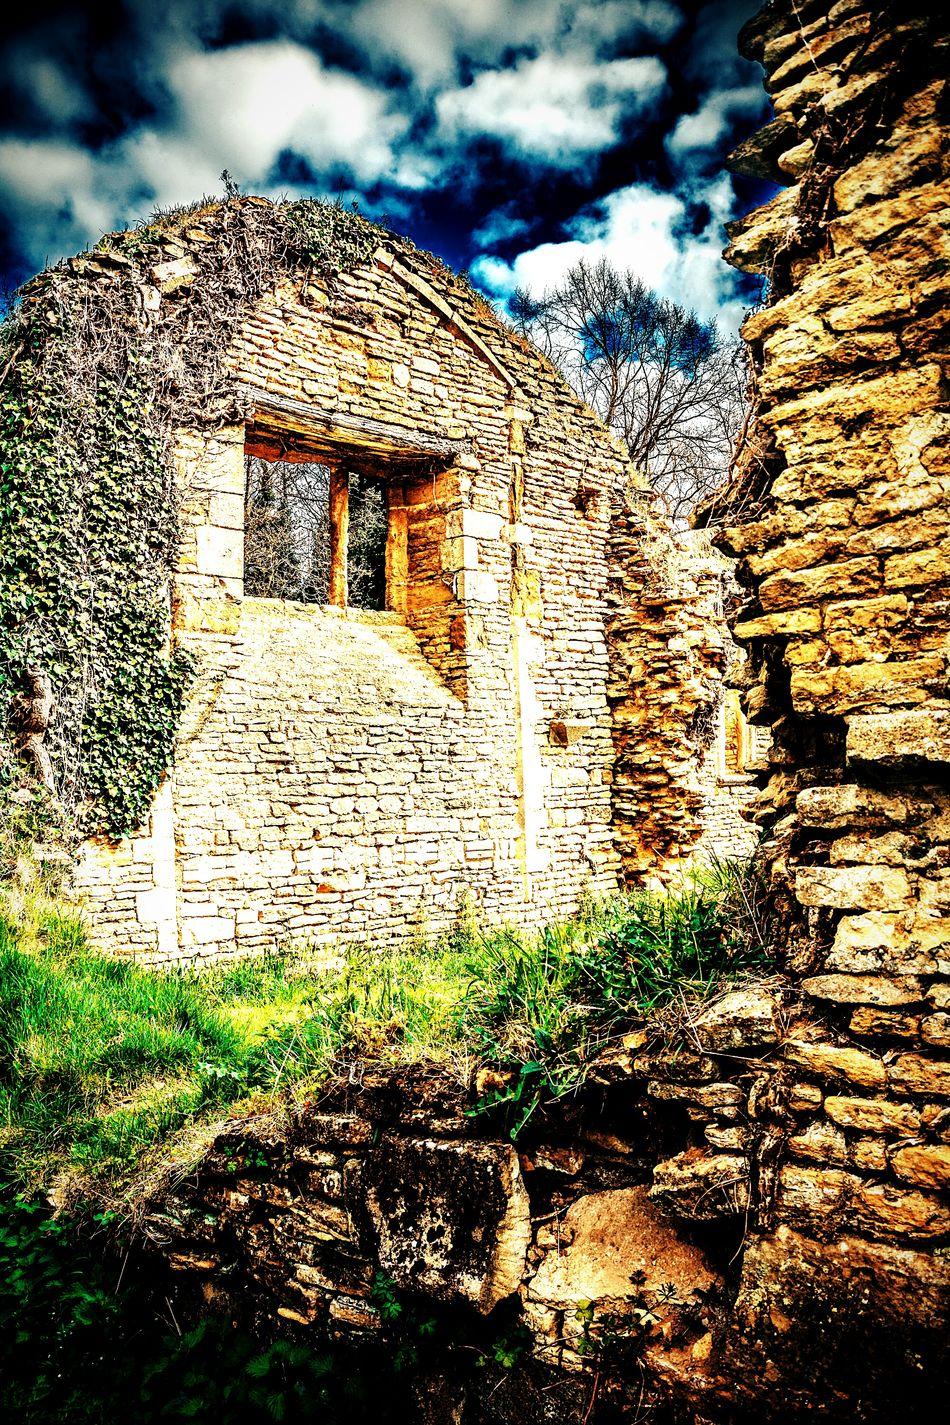 Ruins of St John's Old Church, Boughton, Northamptonshire. Uk Church Ruin Ruins Boughton Northamptonshire Blue Sky Walls